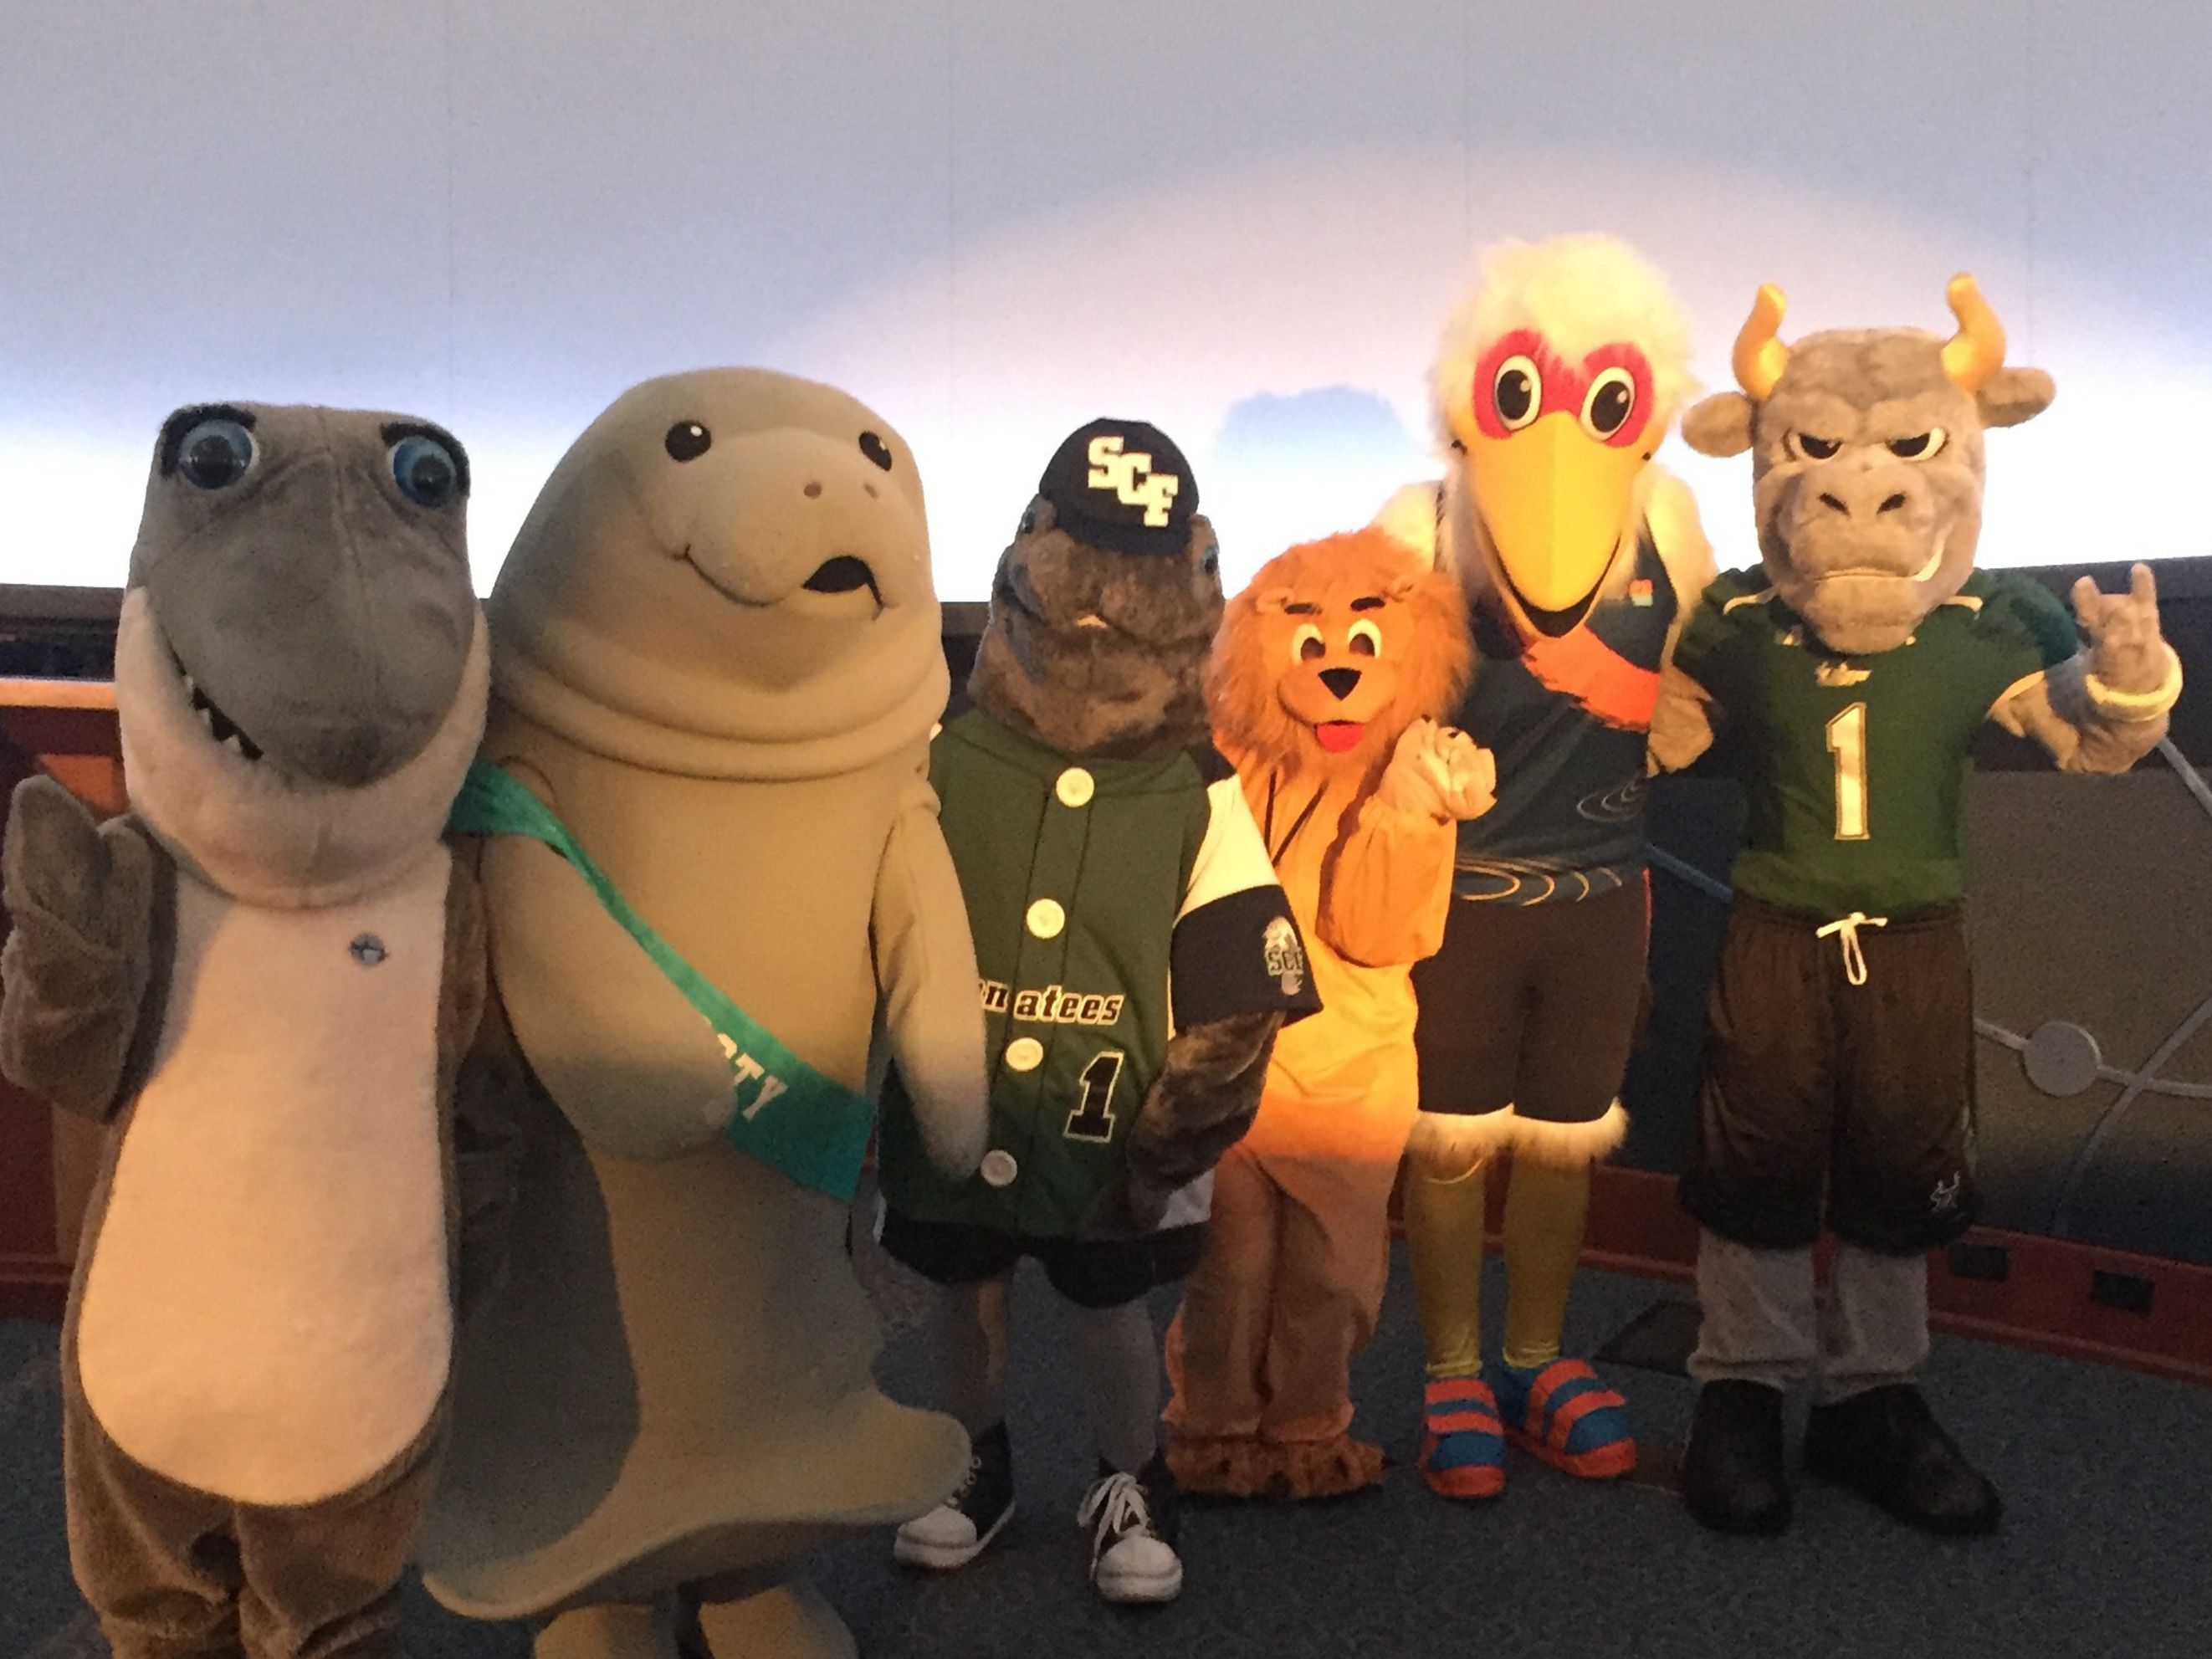 Mascots group rhcrbx